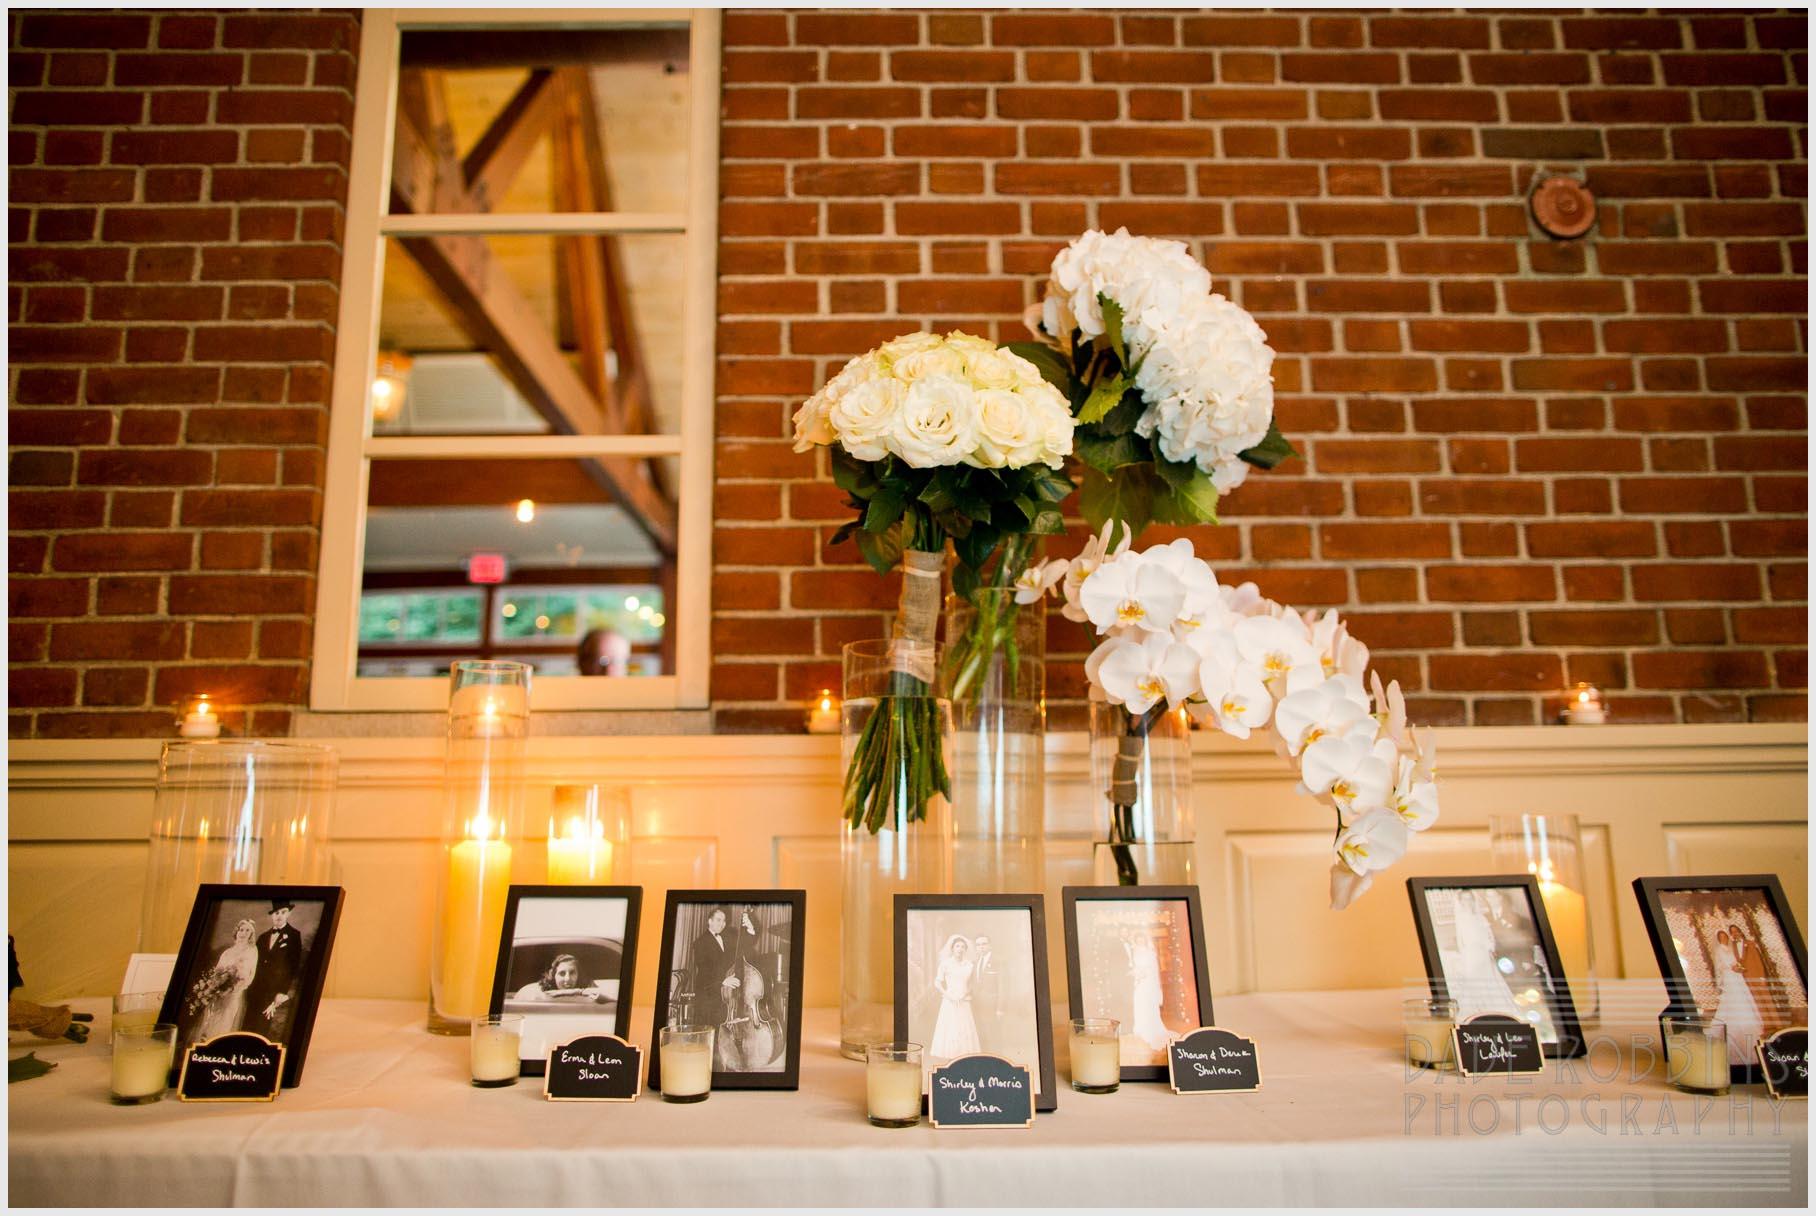 white-flowers-wedding-arrangement-photos